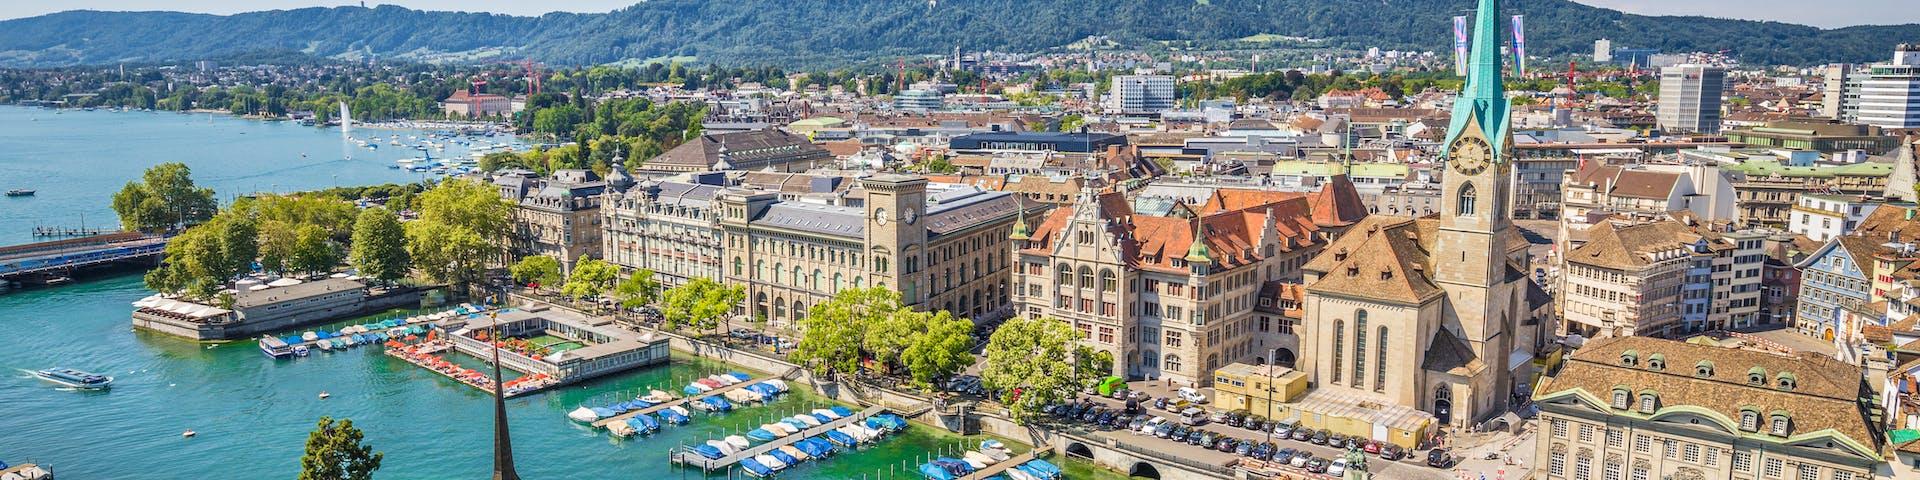 11 Top Ranked Universities In Switzerland World University Rankings Mastersportal Com